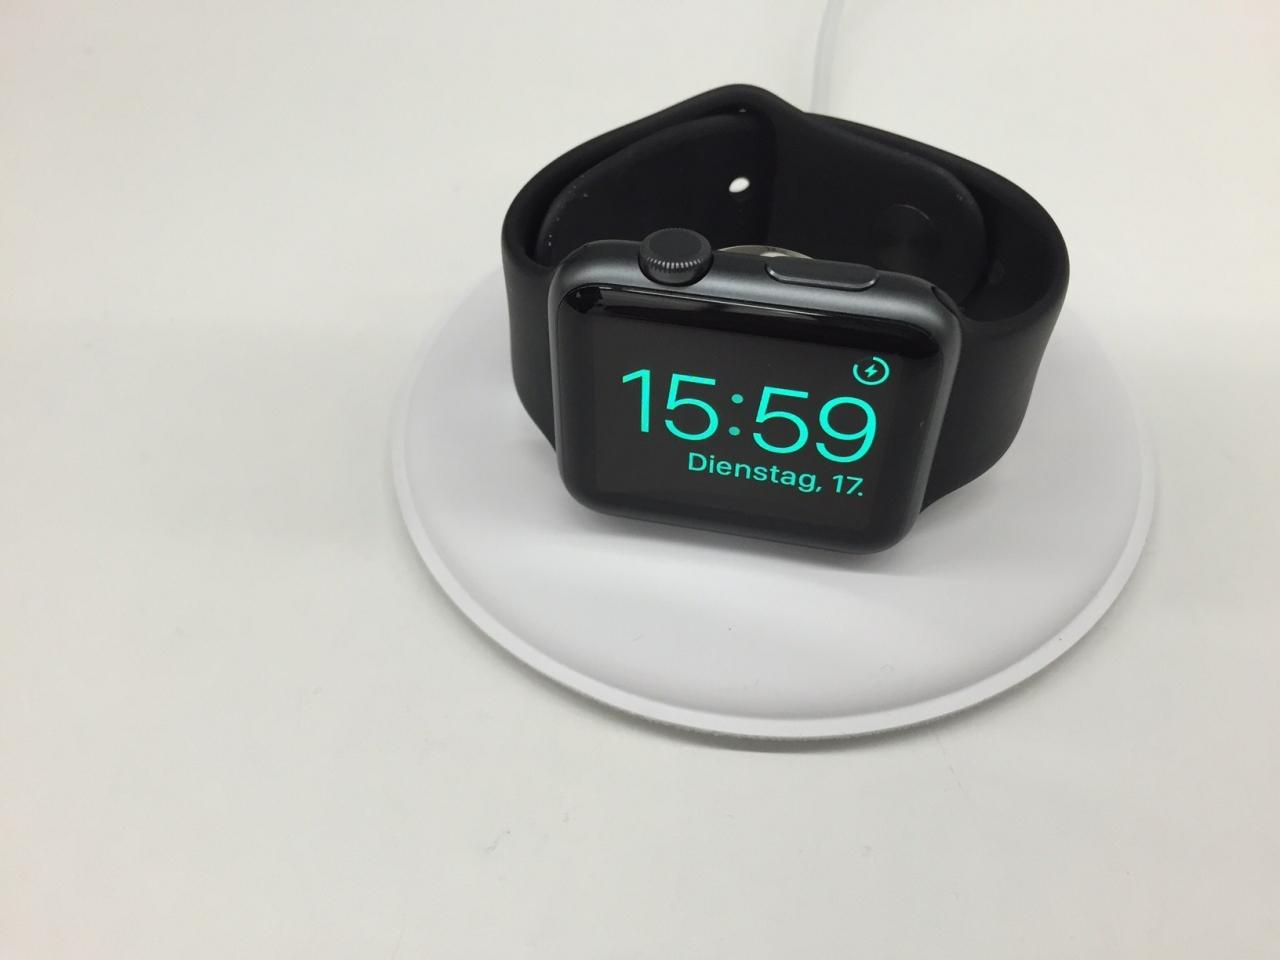 %name Nuove immagini rivelerebbero un Charging Dock ufficiale Apple Watch